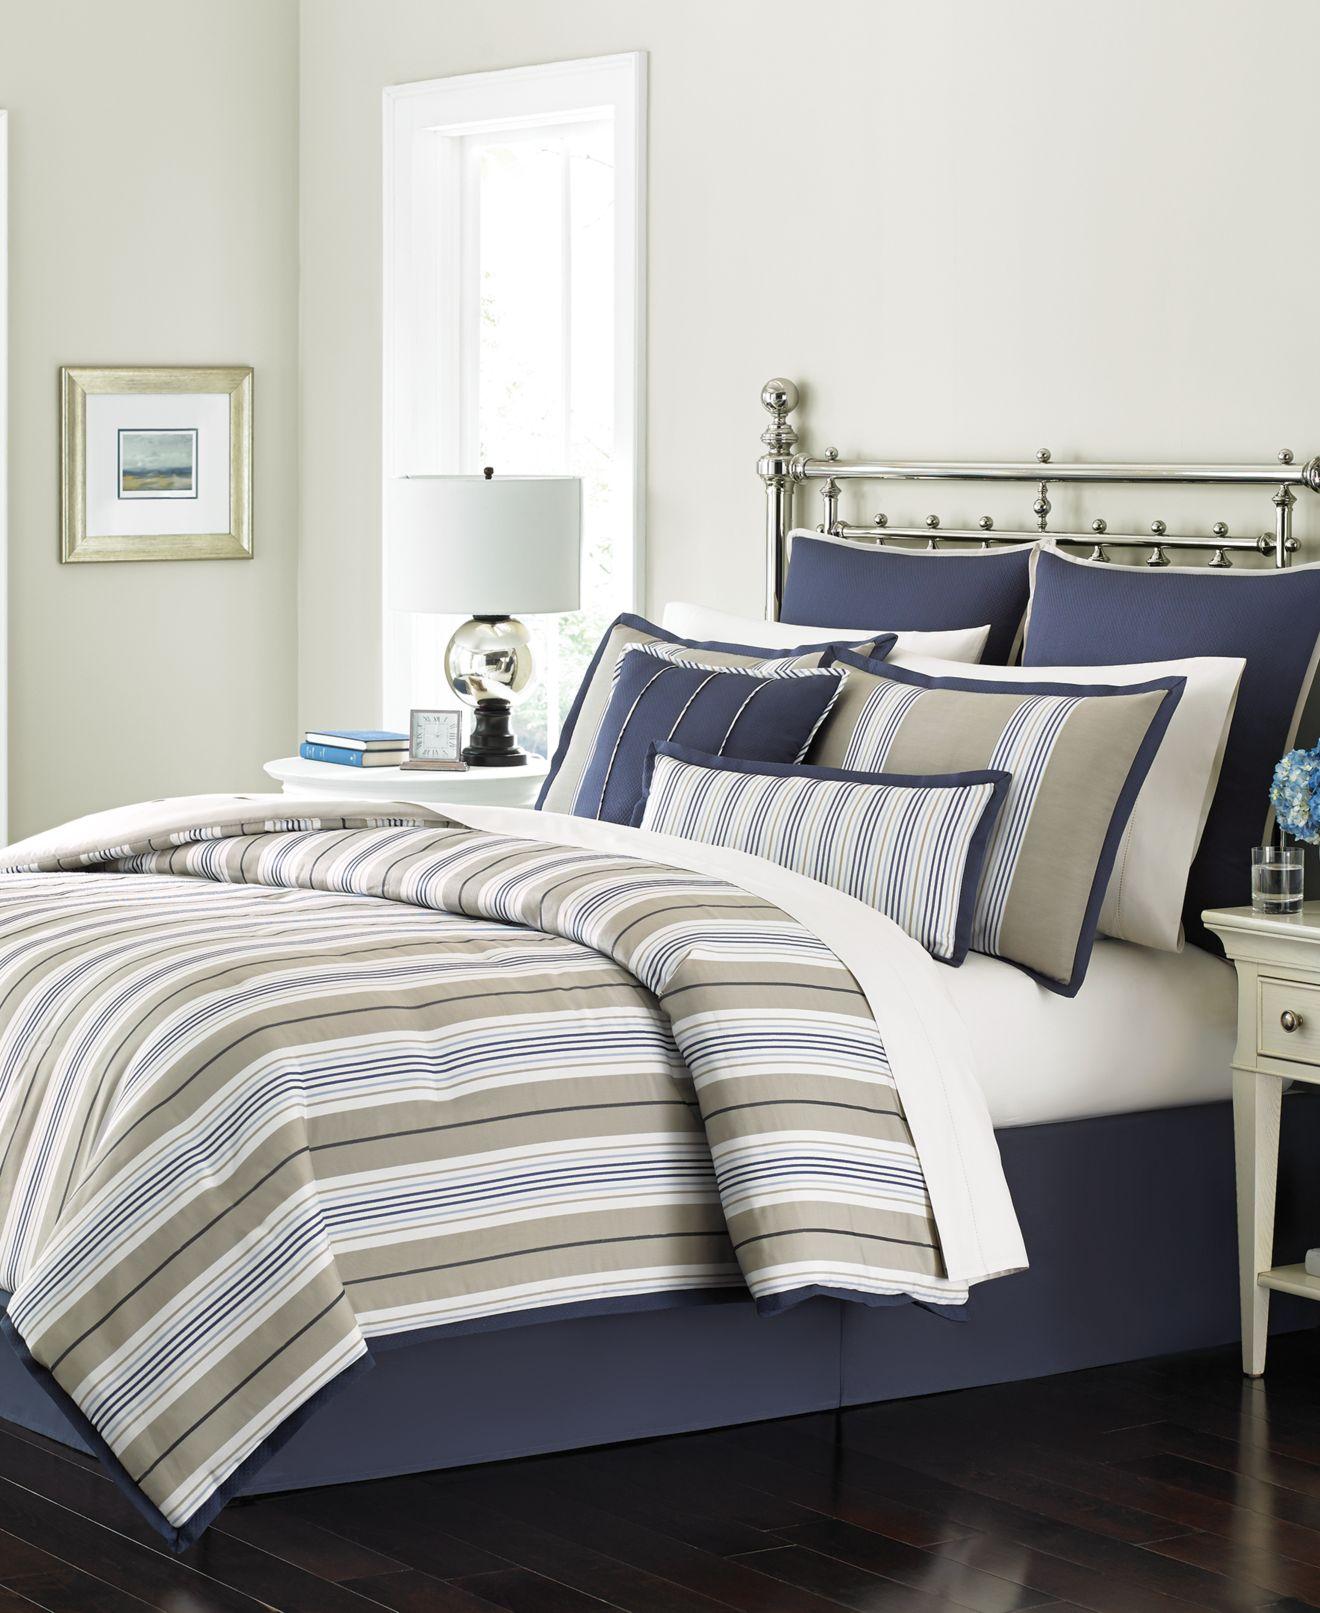 closeout! martha stewart collection madison stripe 6-pc. comforter